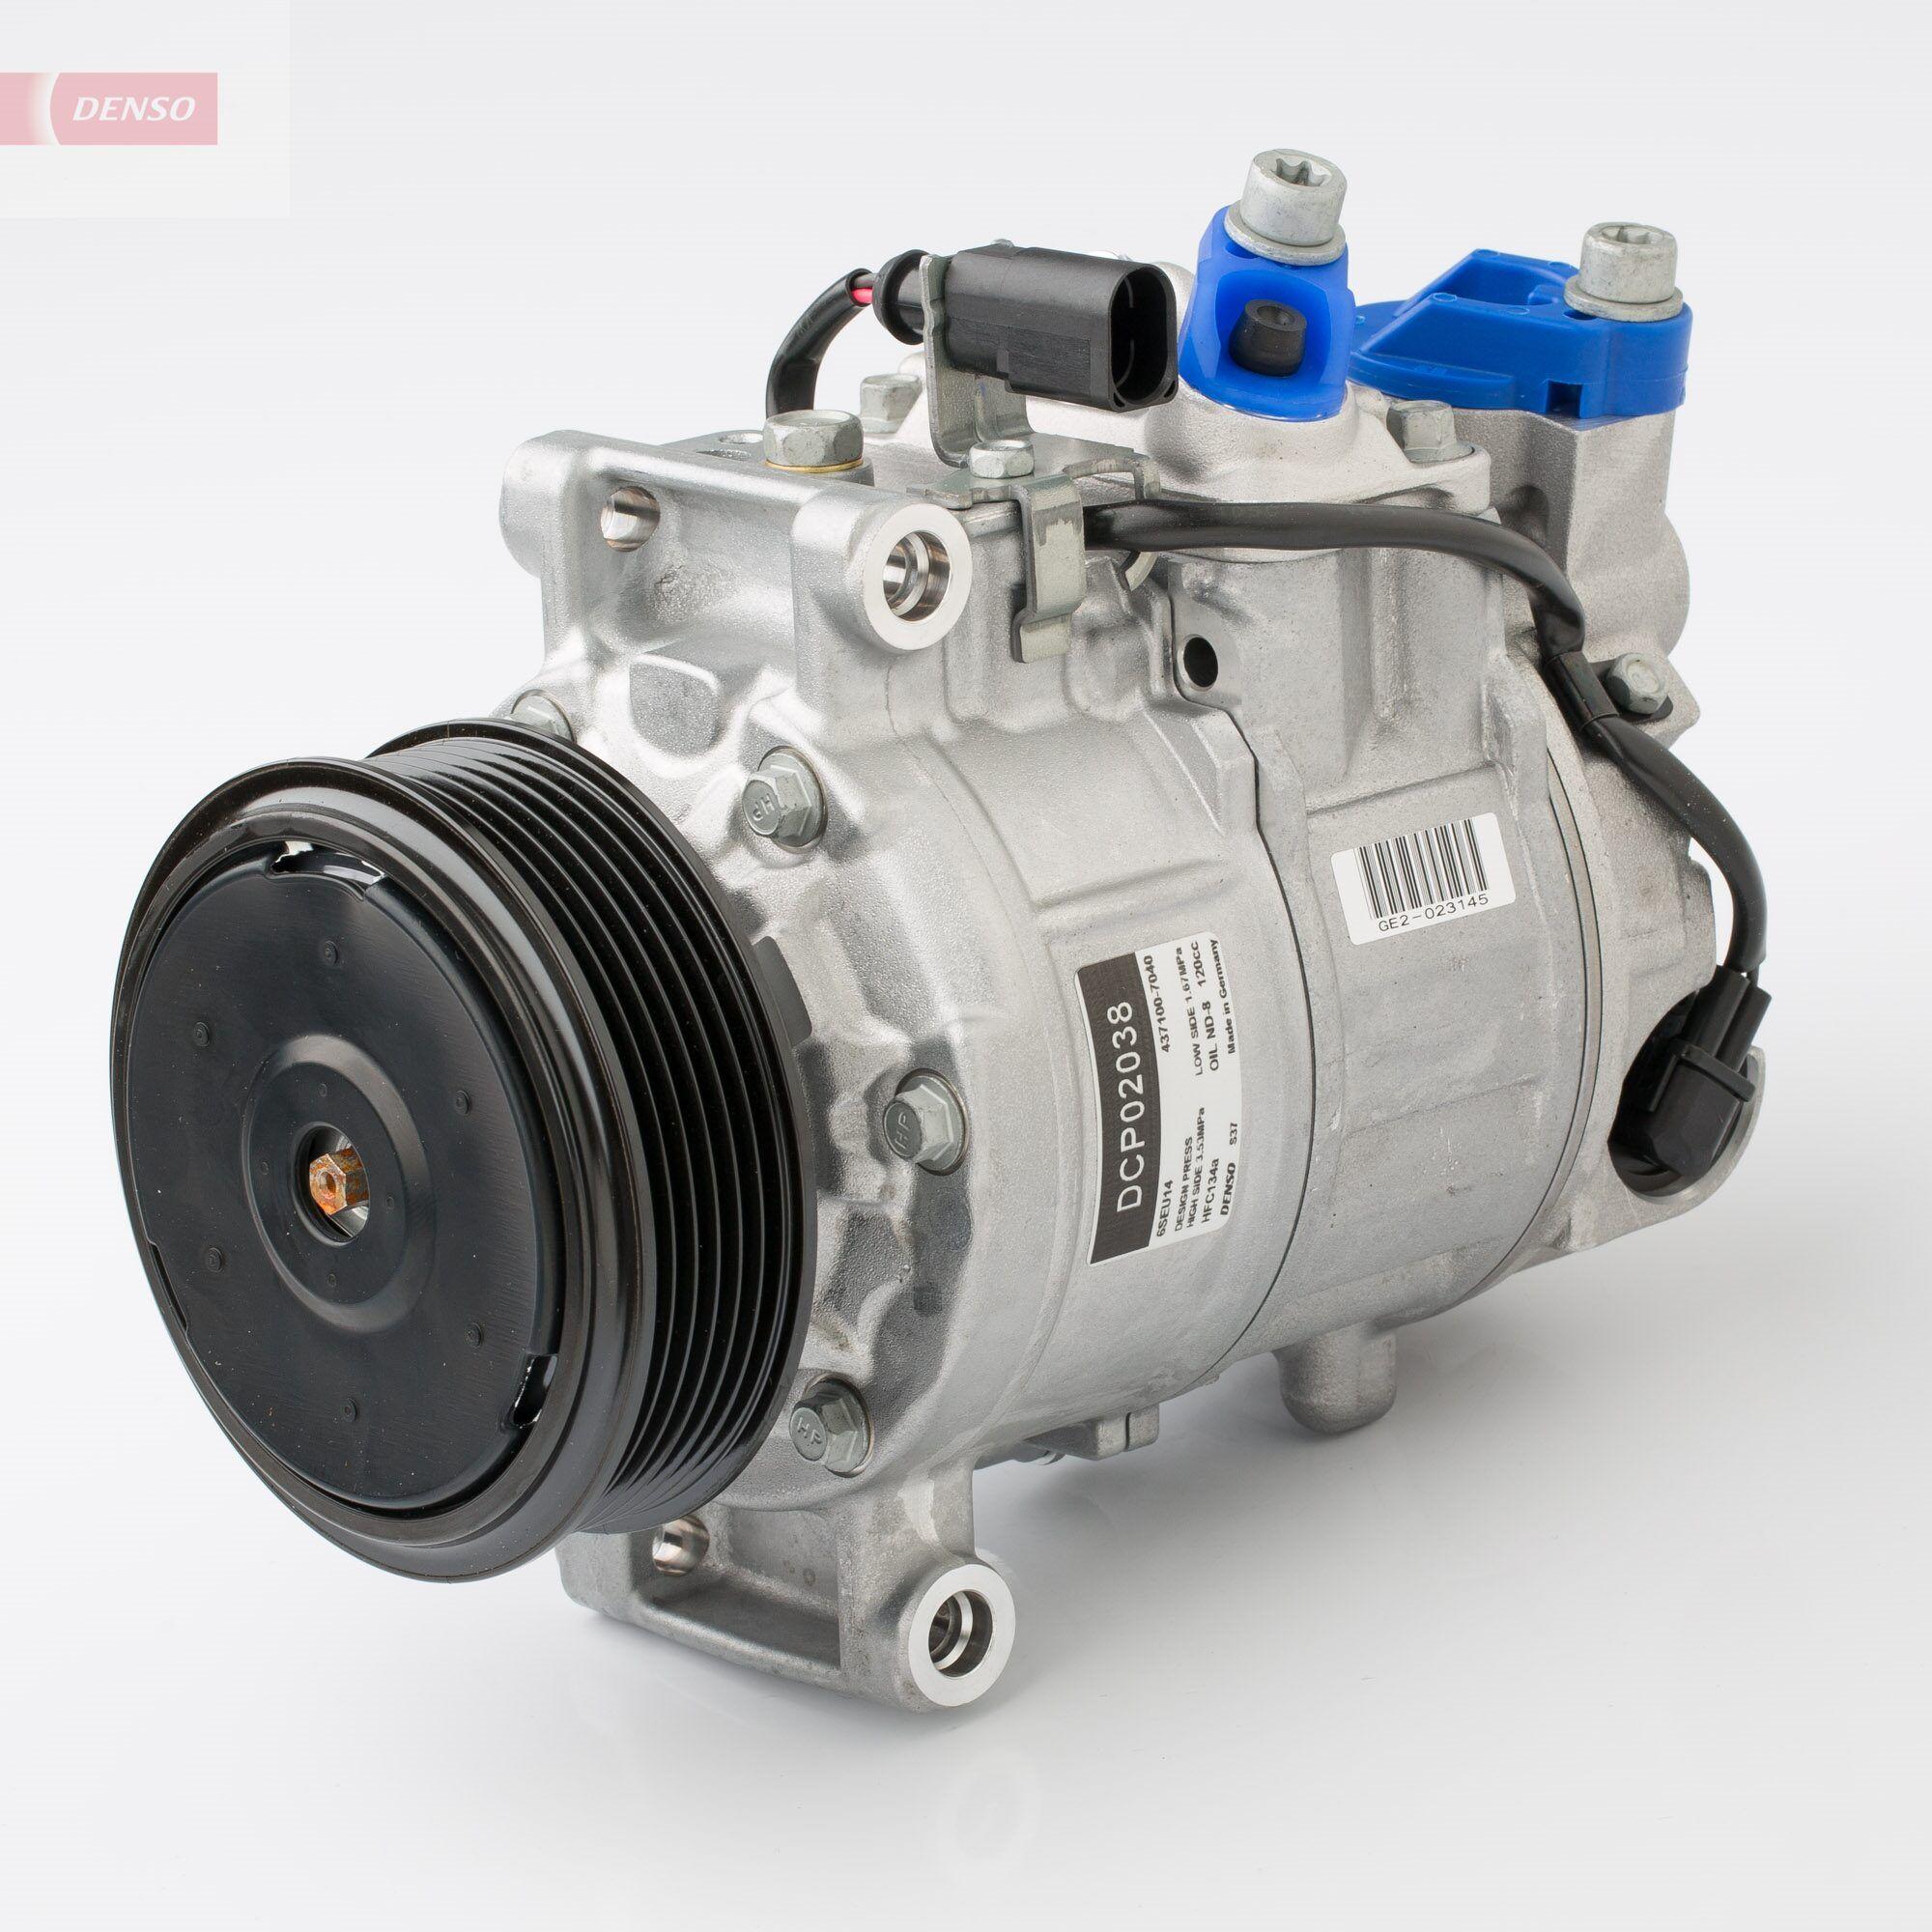 DCP02038 Klimakompressor DENSO Test